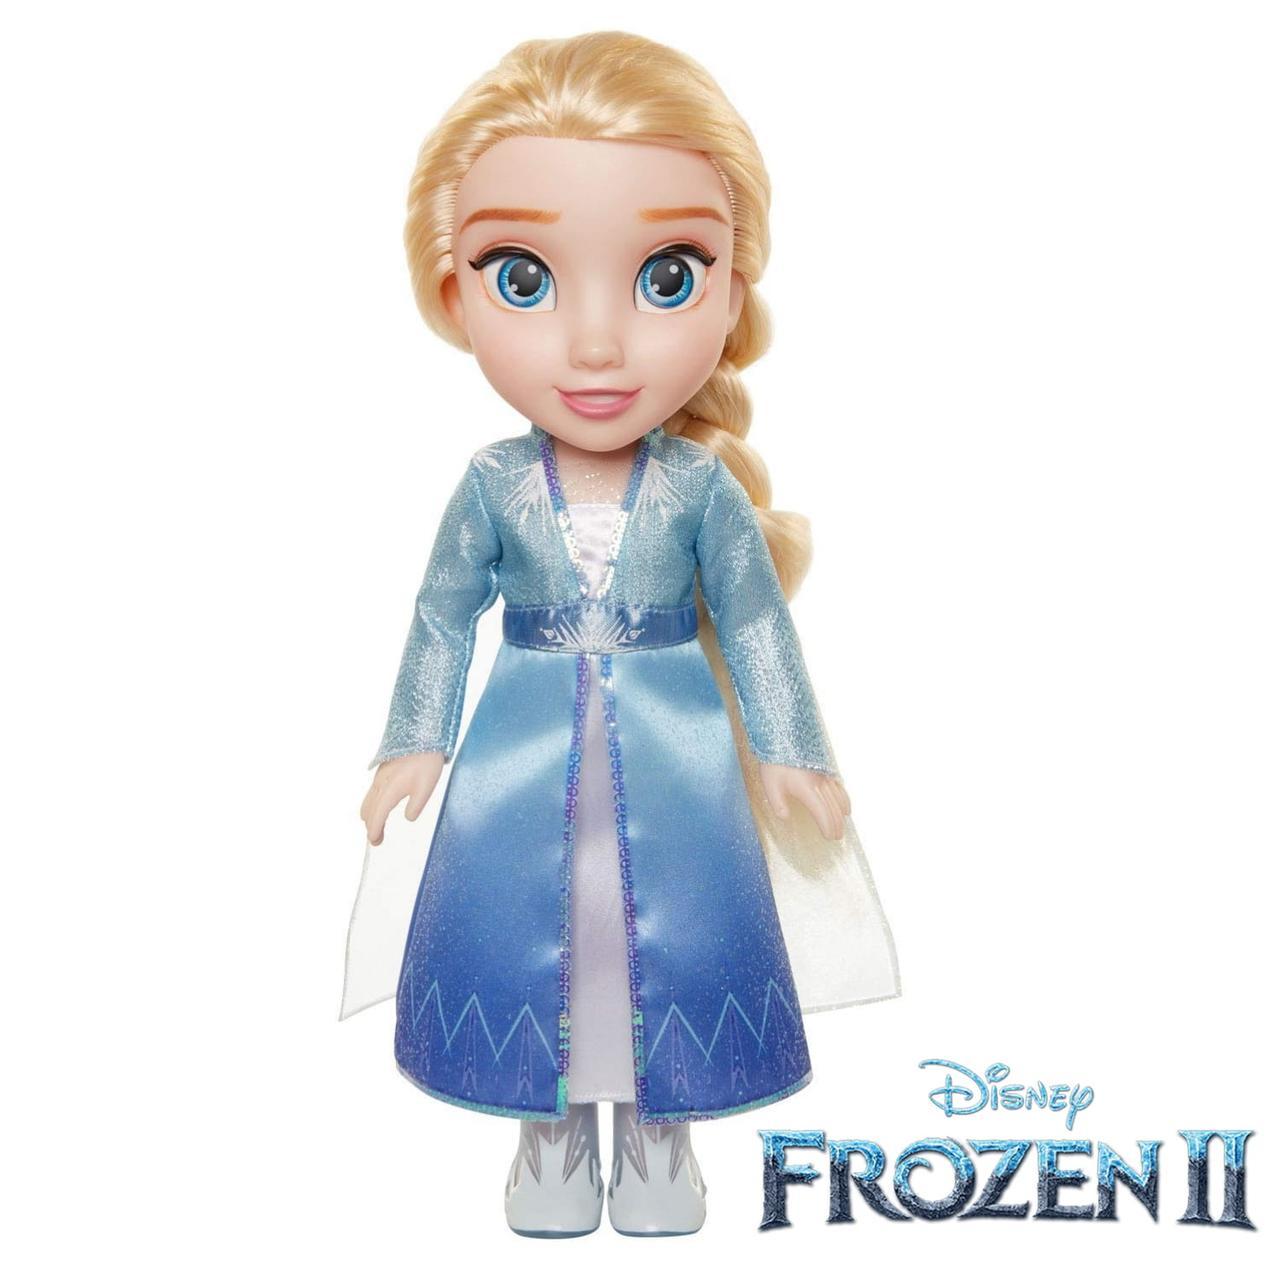 Кукла Disney Frozen 2 Путешествие Эльзы Disney Frozen 2 Elsa Travel Doll